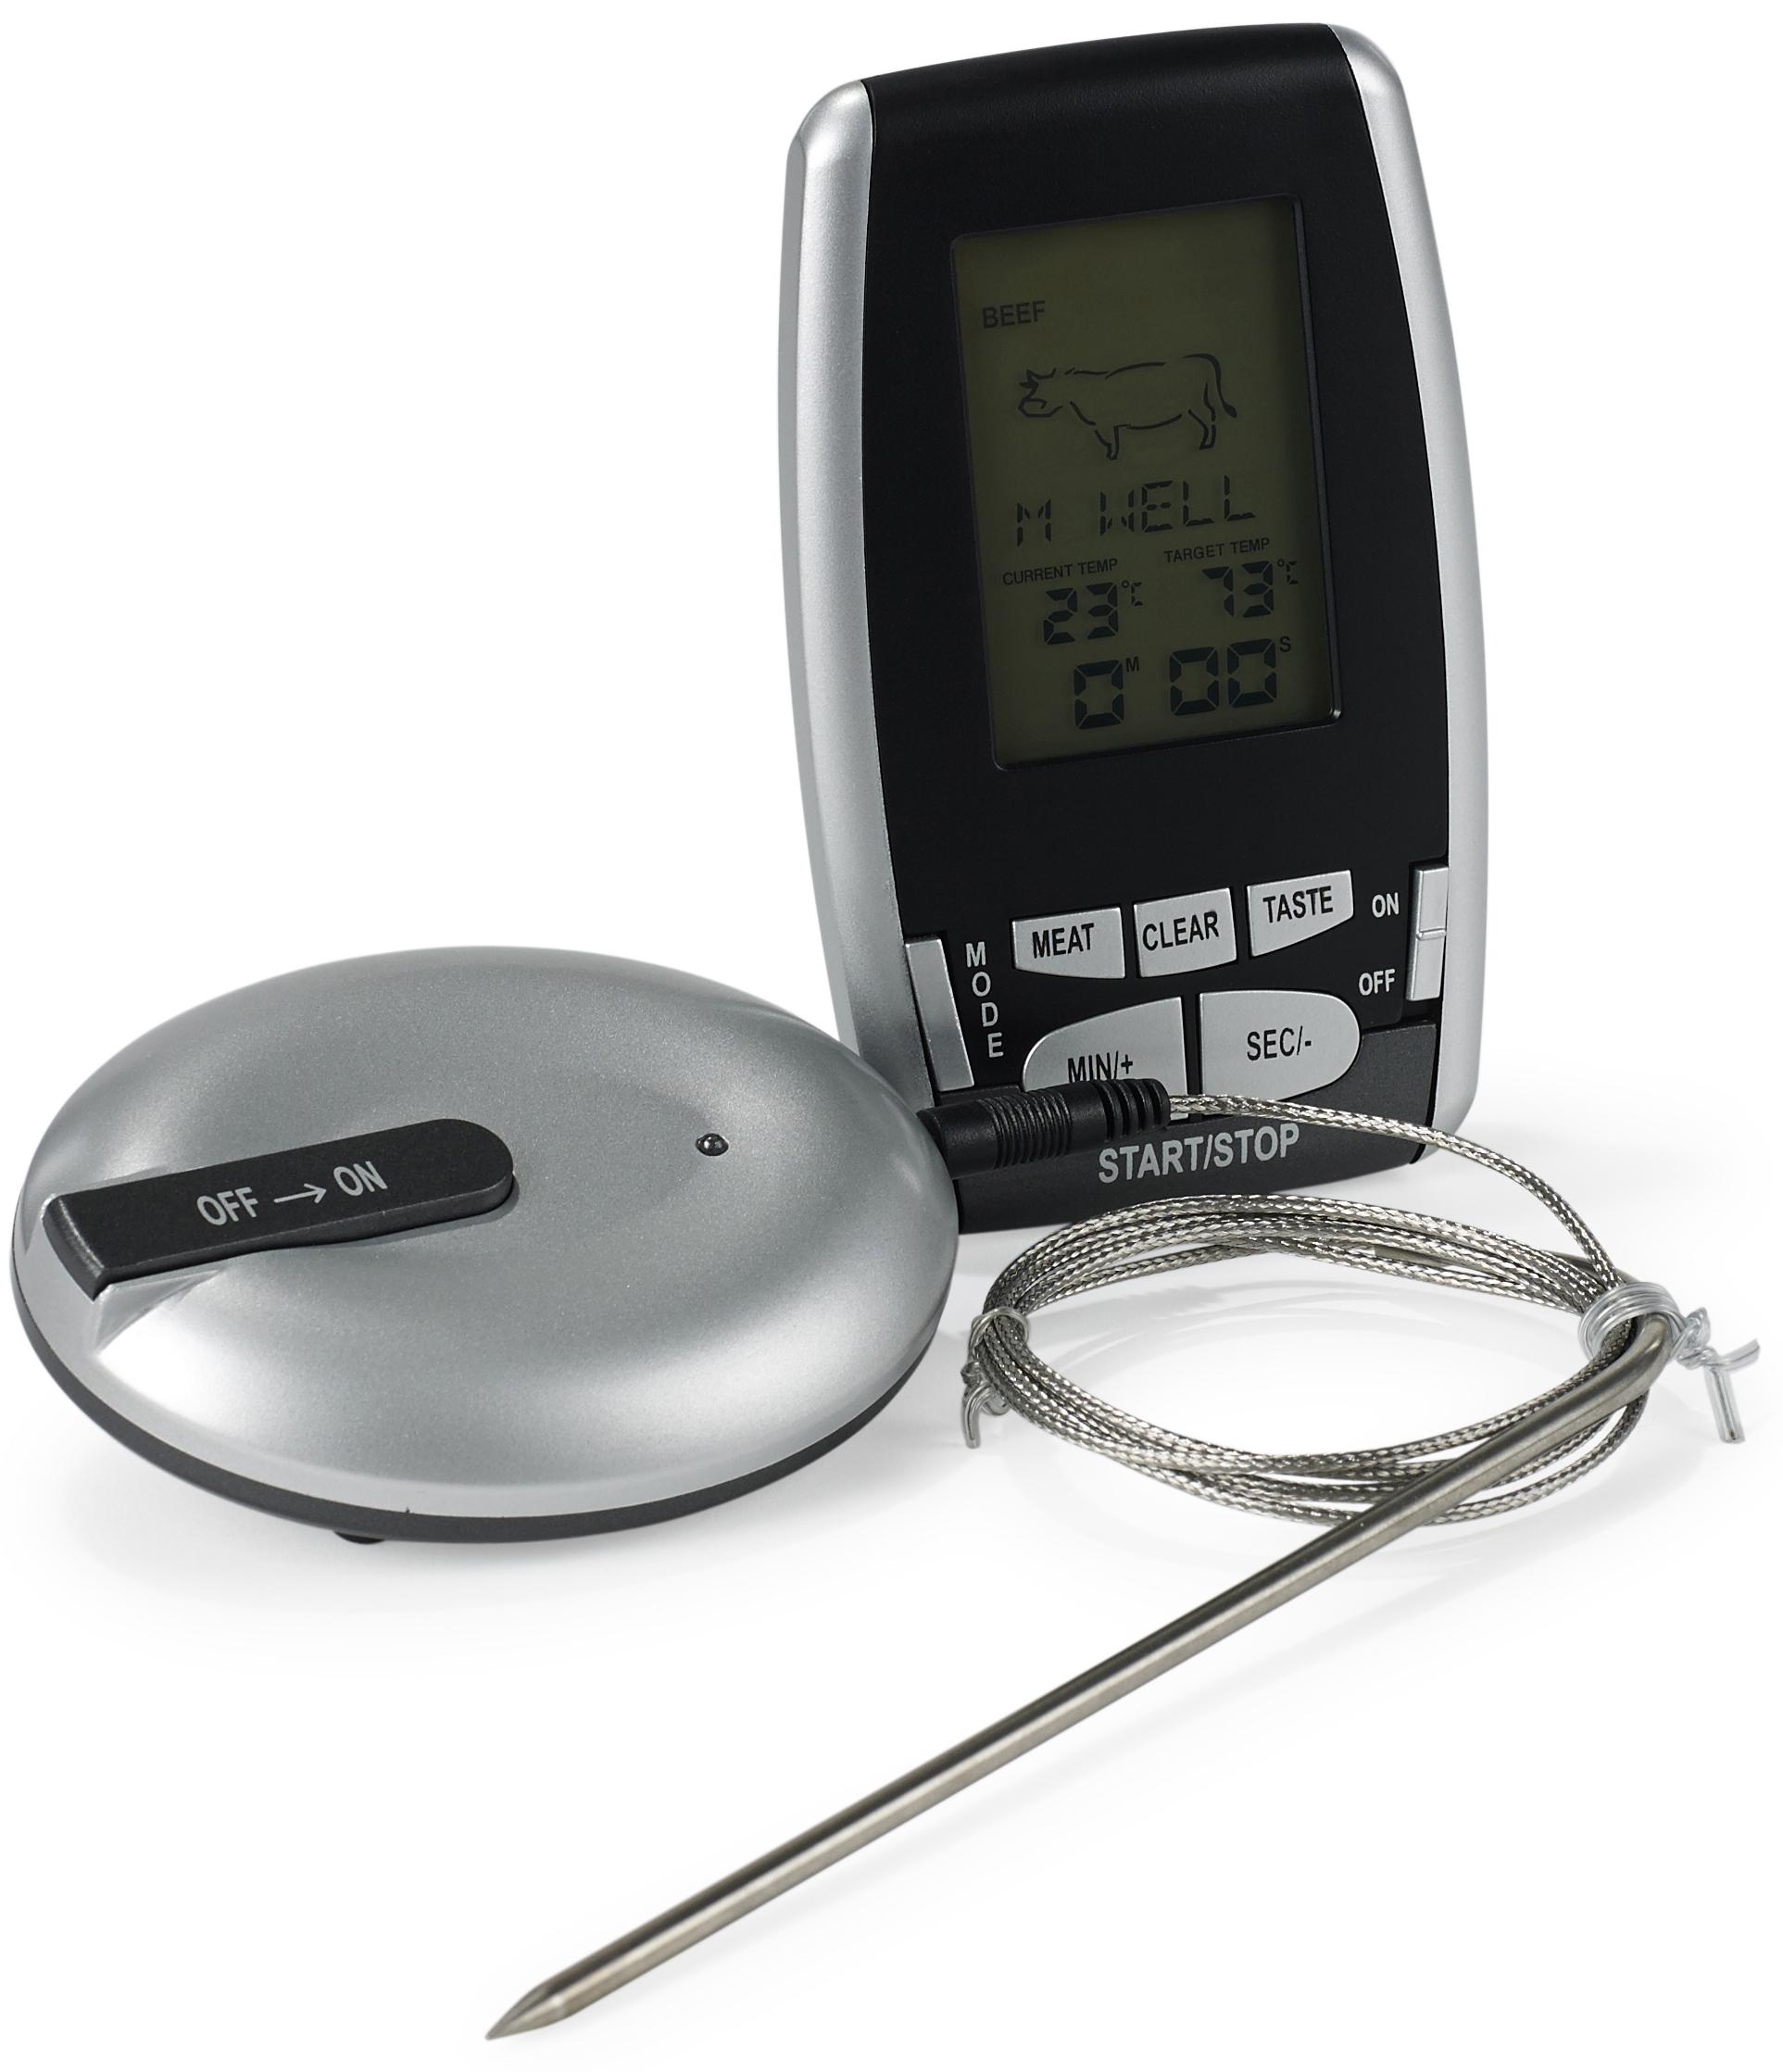 Trådlös Stektermometer Digital